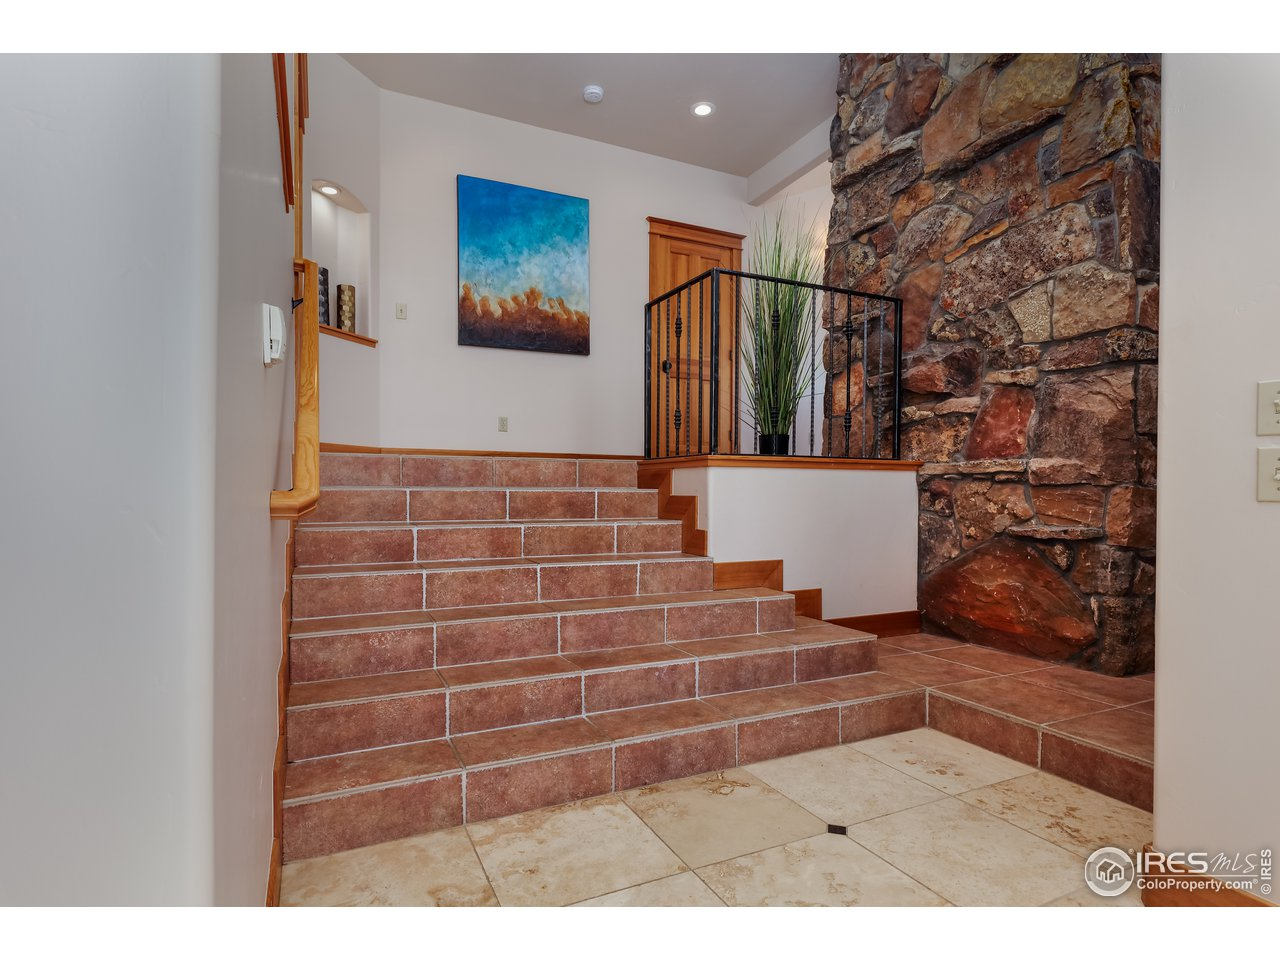 Gracious foyer entrance